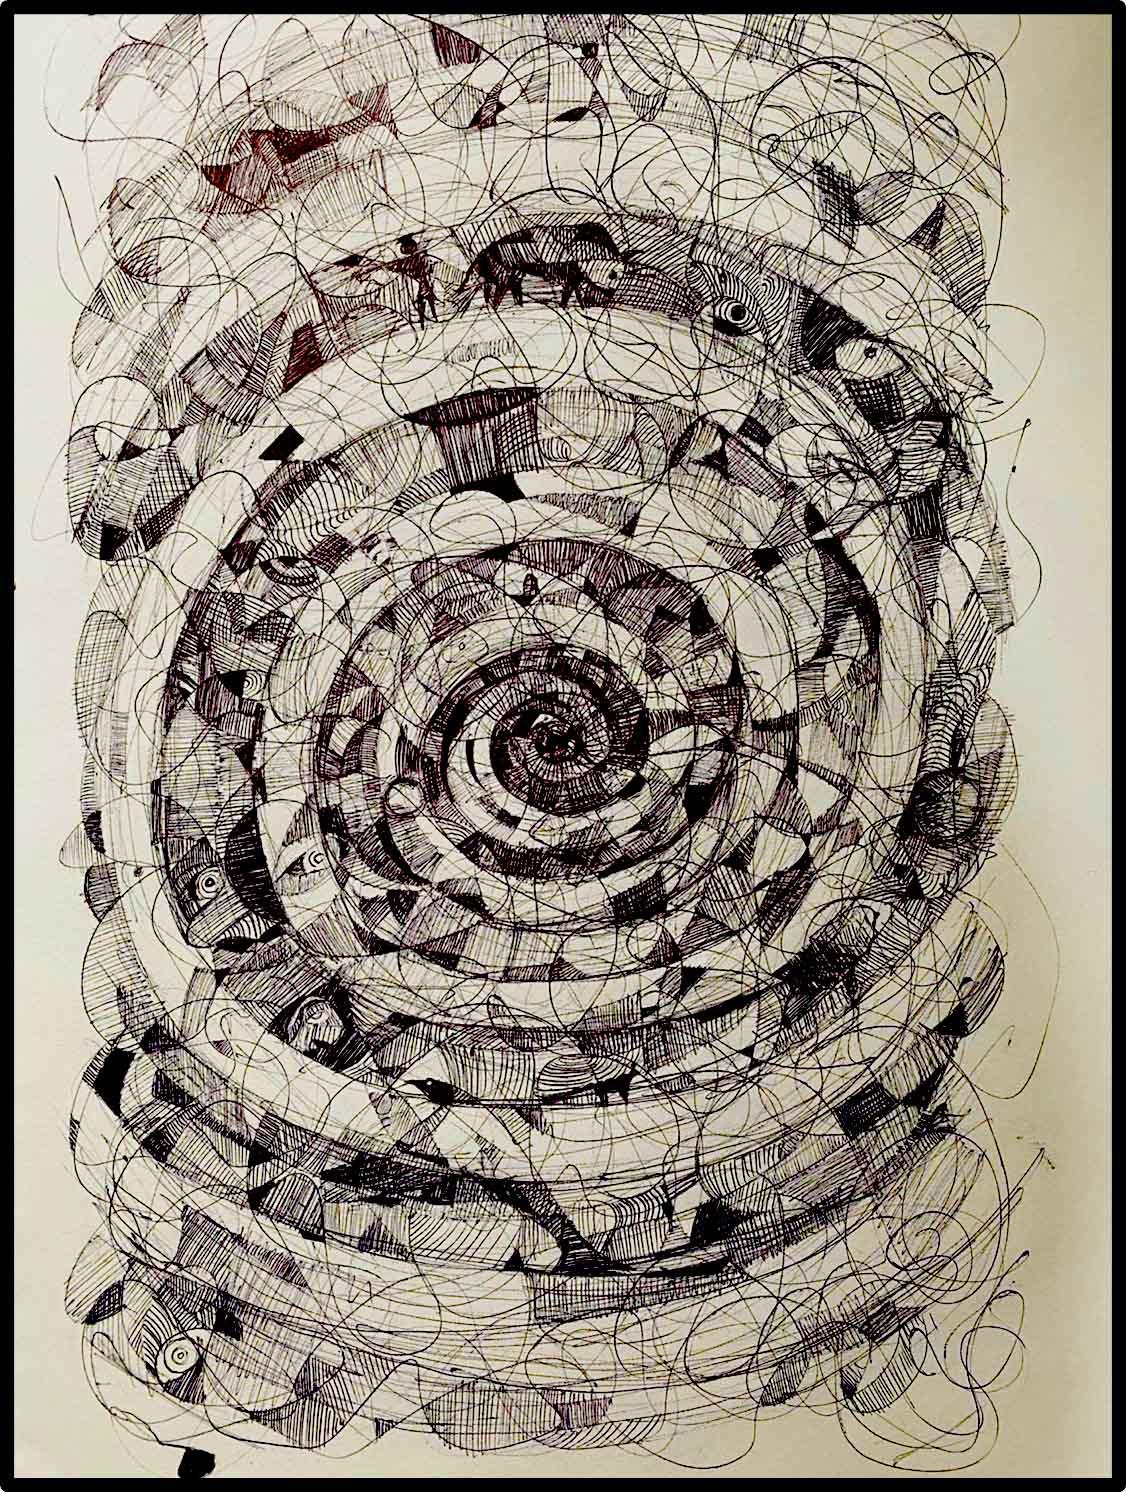 The Ascend by Umang Sakar